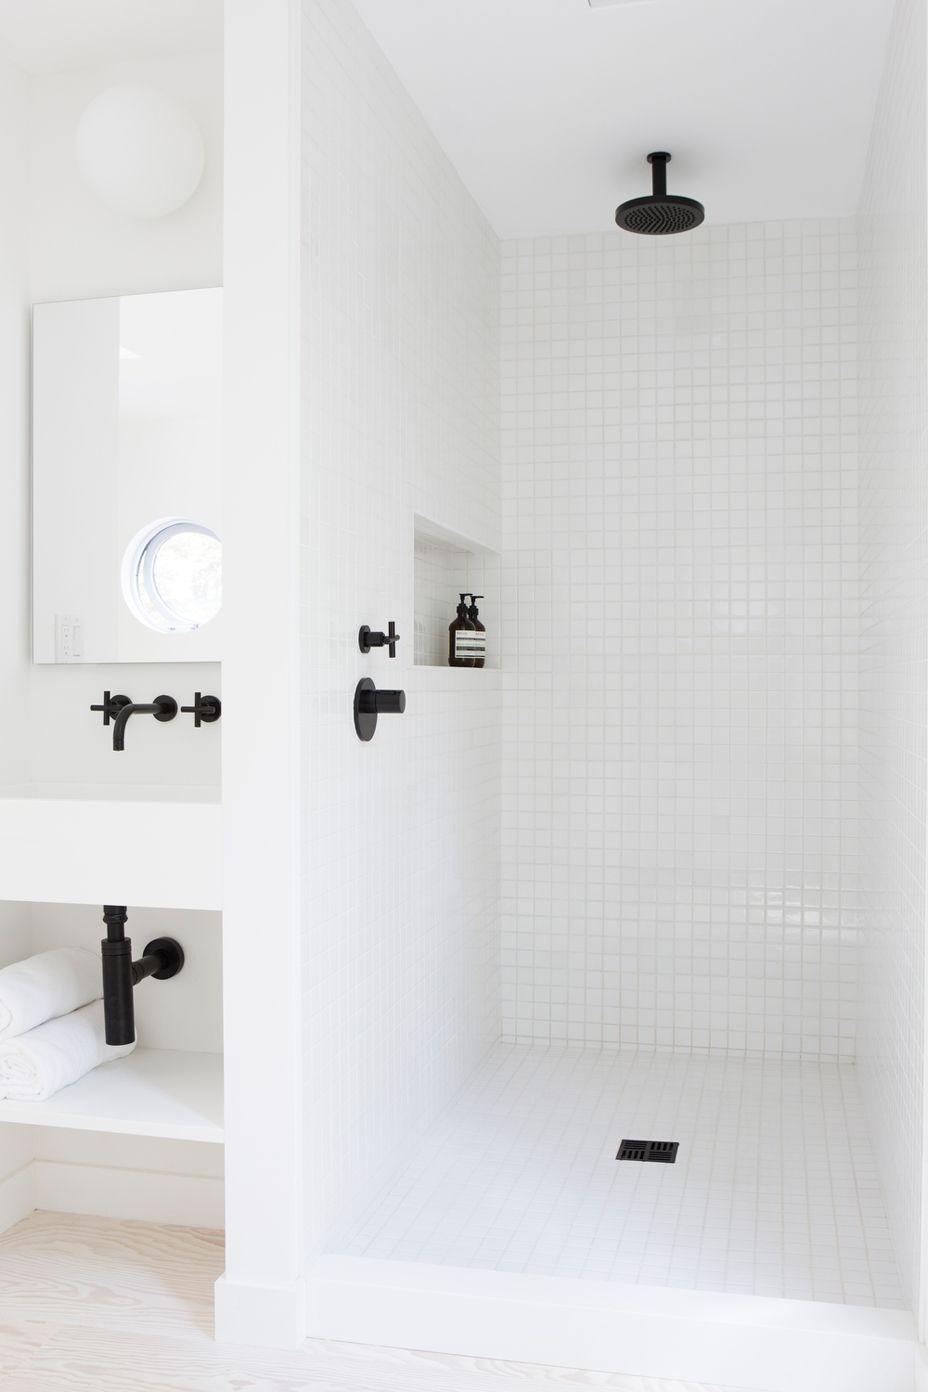 Red Dirt House Renovation by Amee Allsop 8 | Bathroom | Pinterest ...